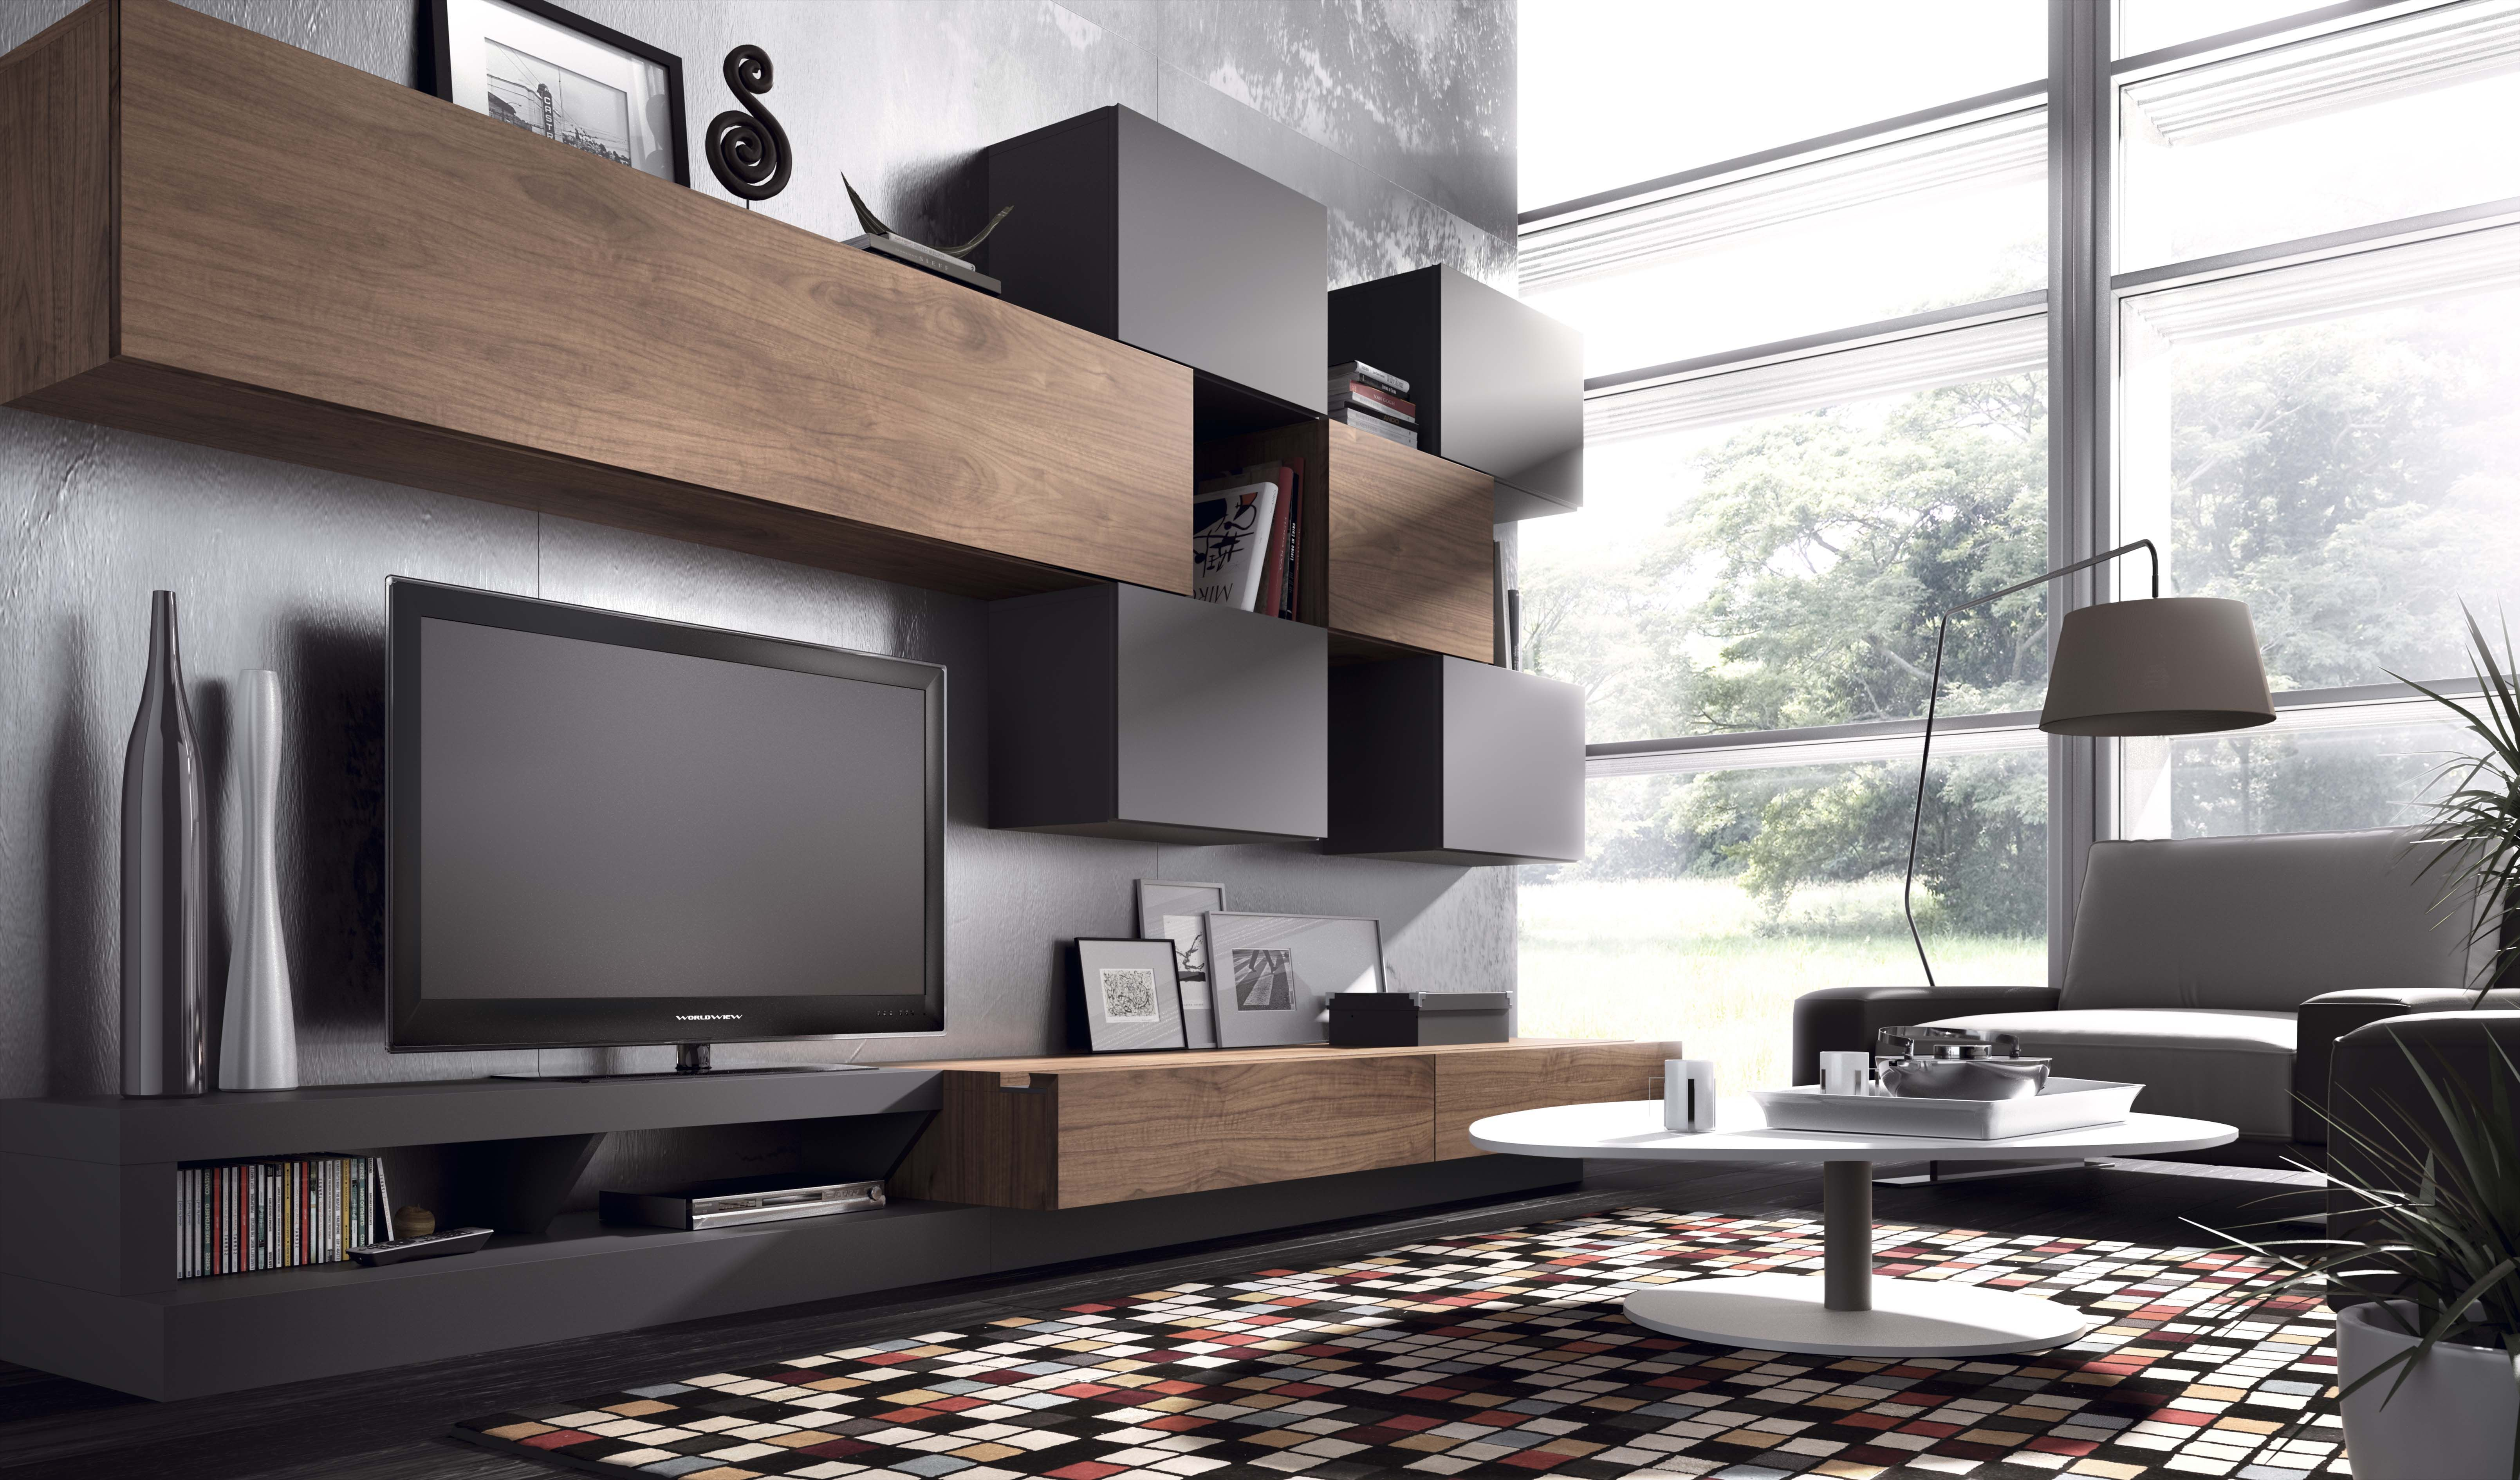 Catalogo de muebles de salon 37542 muebles ideas for Catalogo de salones